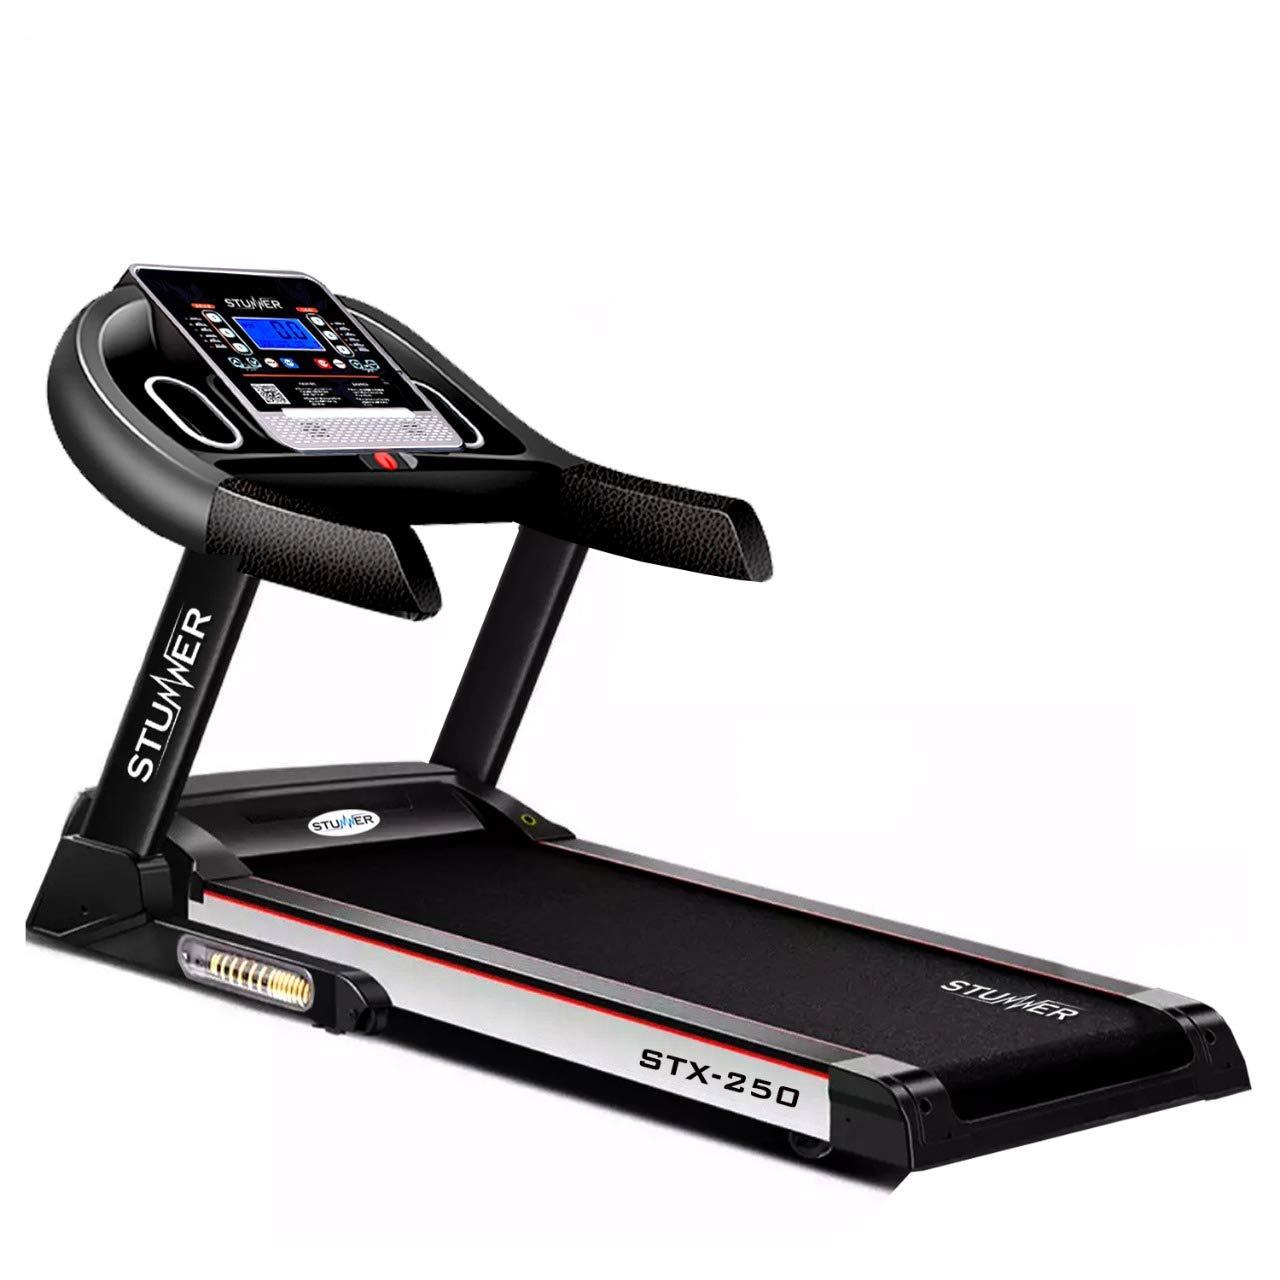 Stunner Fitness STX-250 (2.0 HP) Motorised Treadmill with